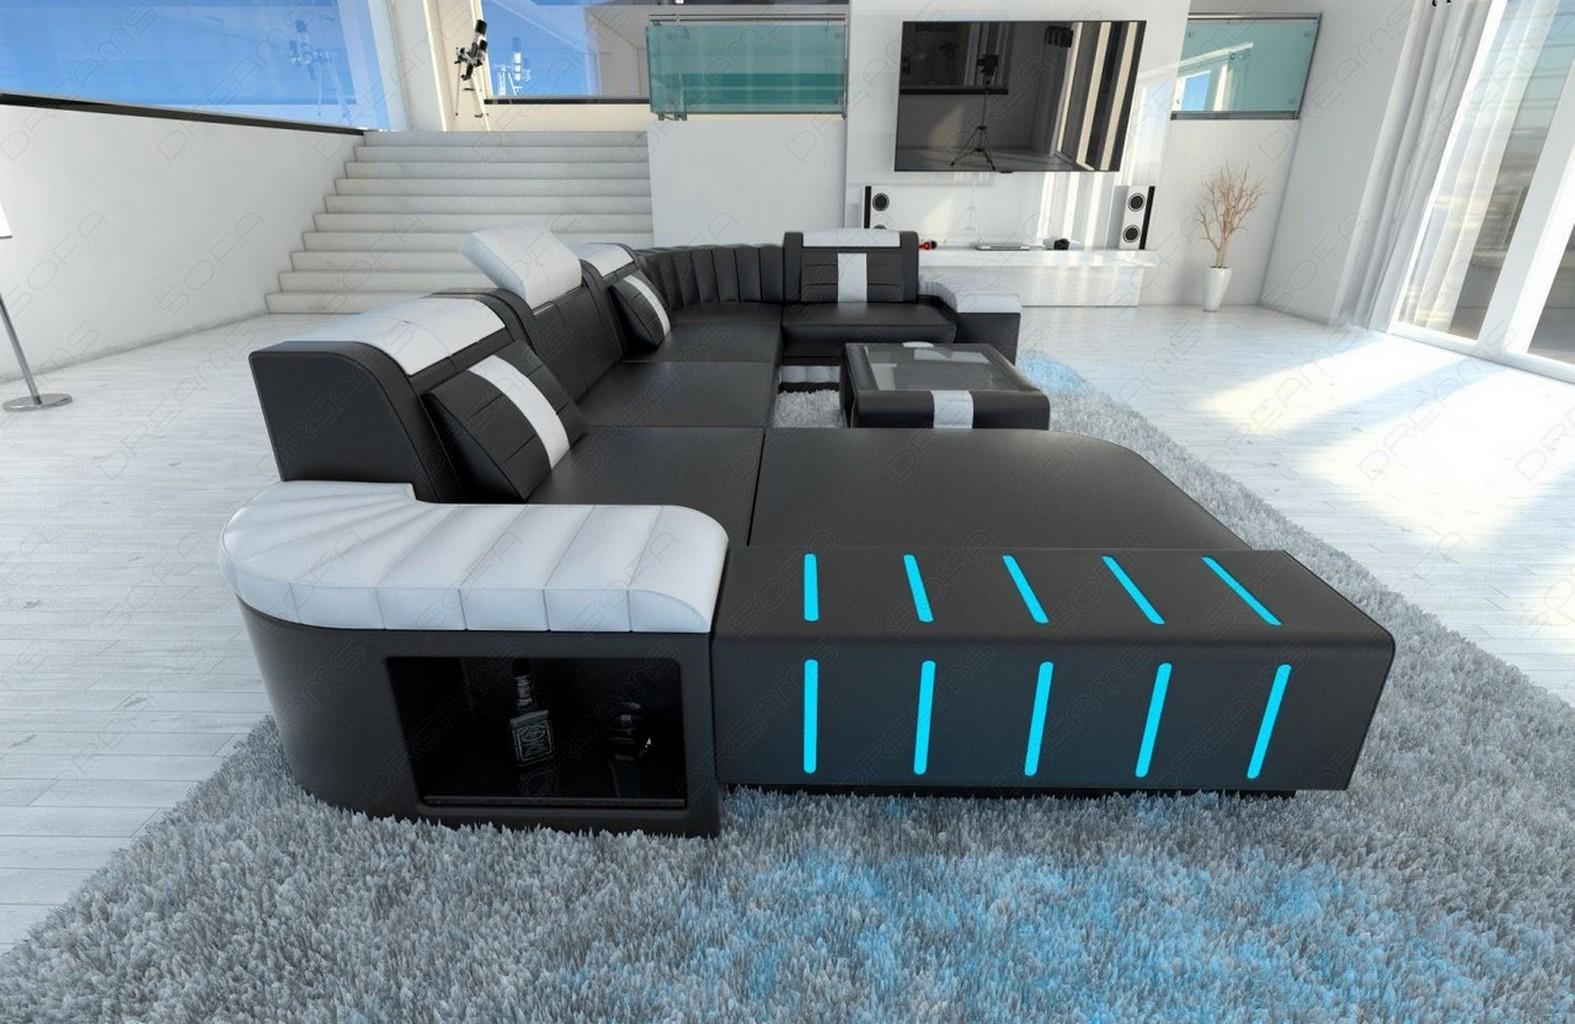 designsofa ledercouch sofa wohnlandschaft bellagio led beleuchtung schwarz weiss ebay. Black Bedroom Furniture Sets. Home Design Ideas